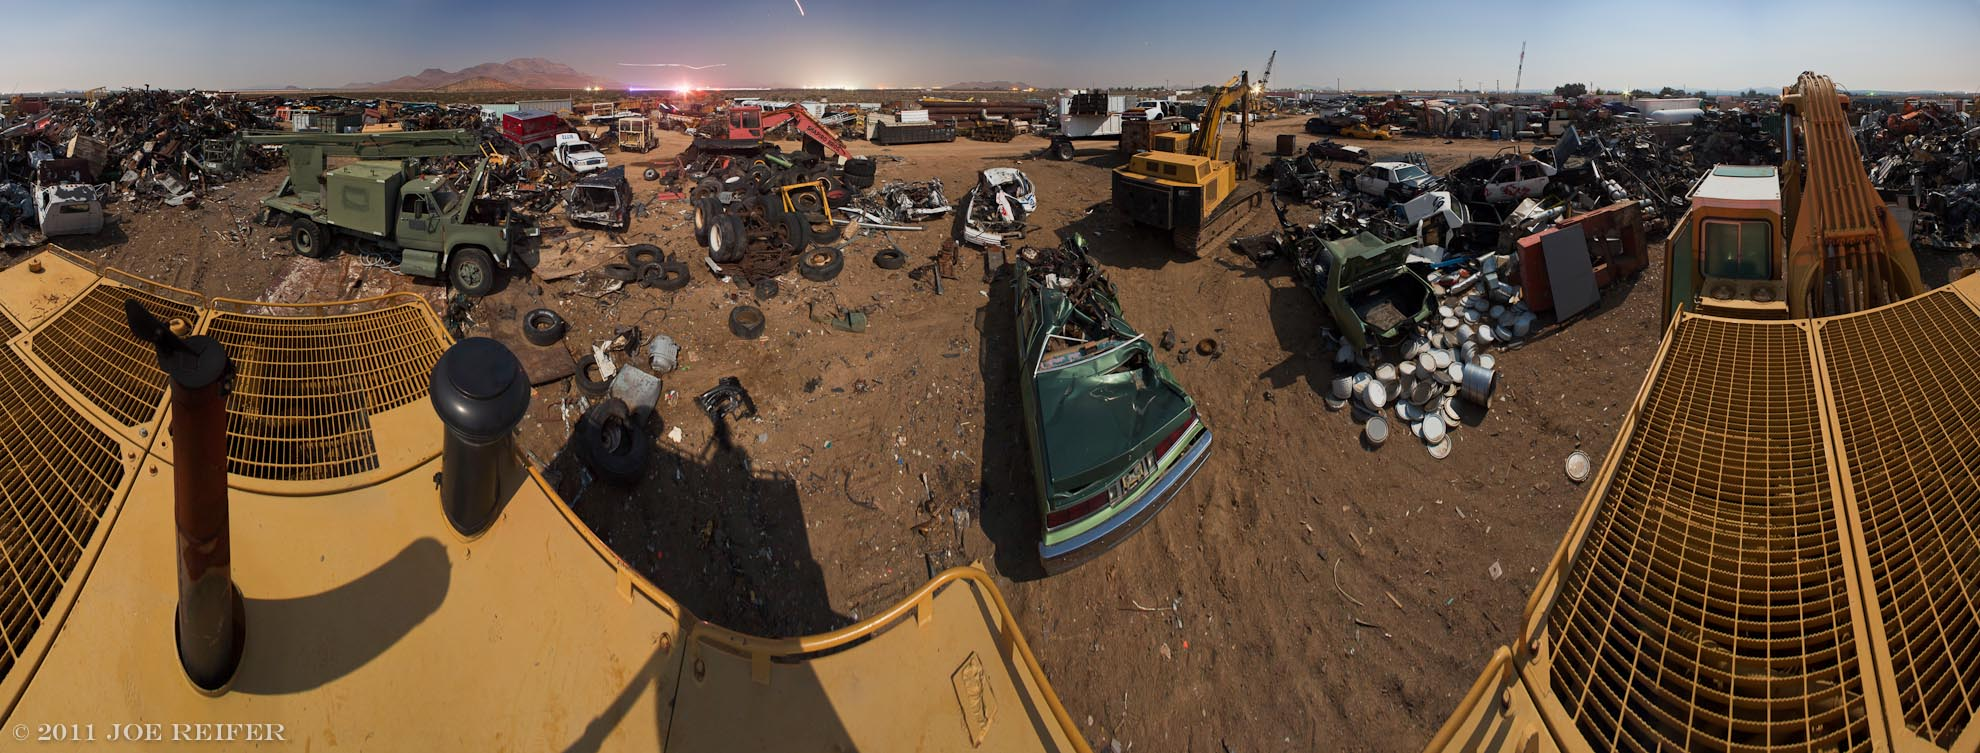 Junkyard accident night panorama -- by Joe Reifer